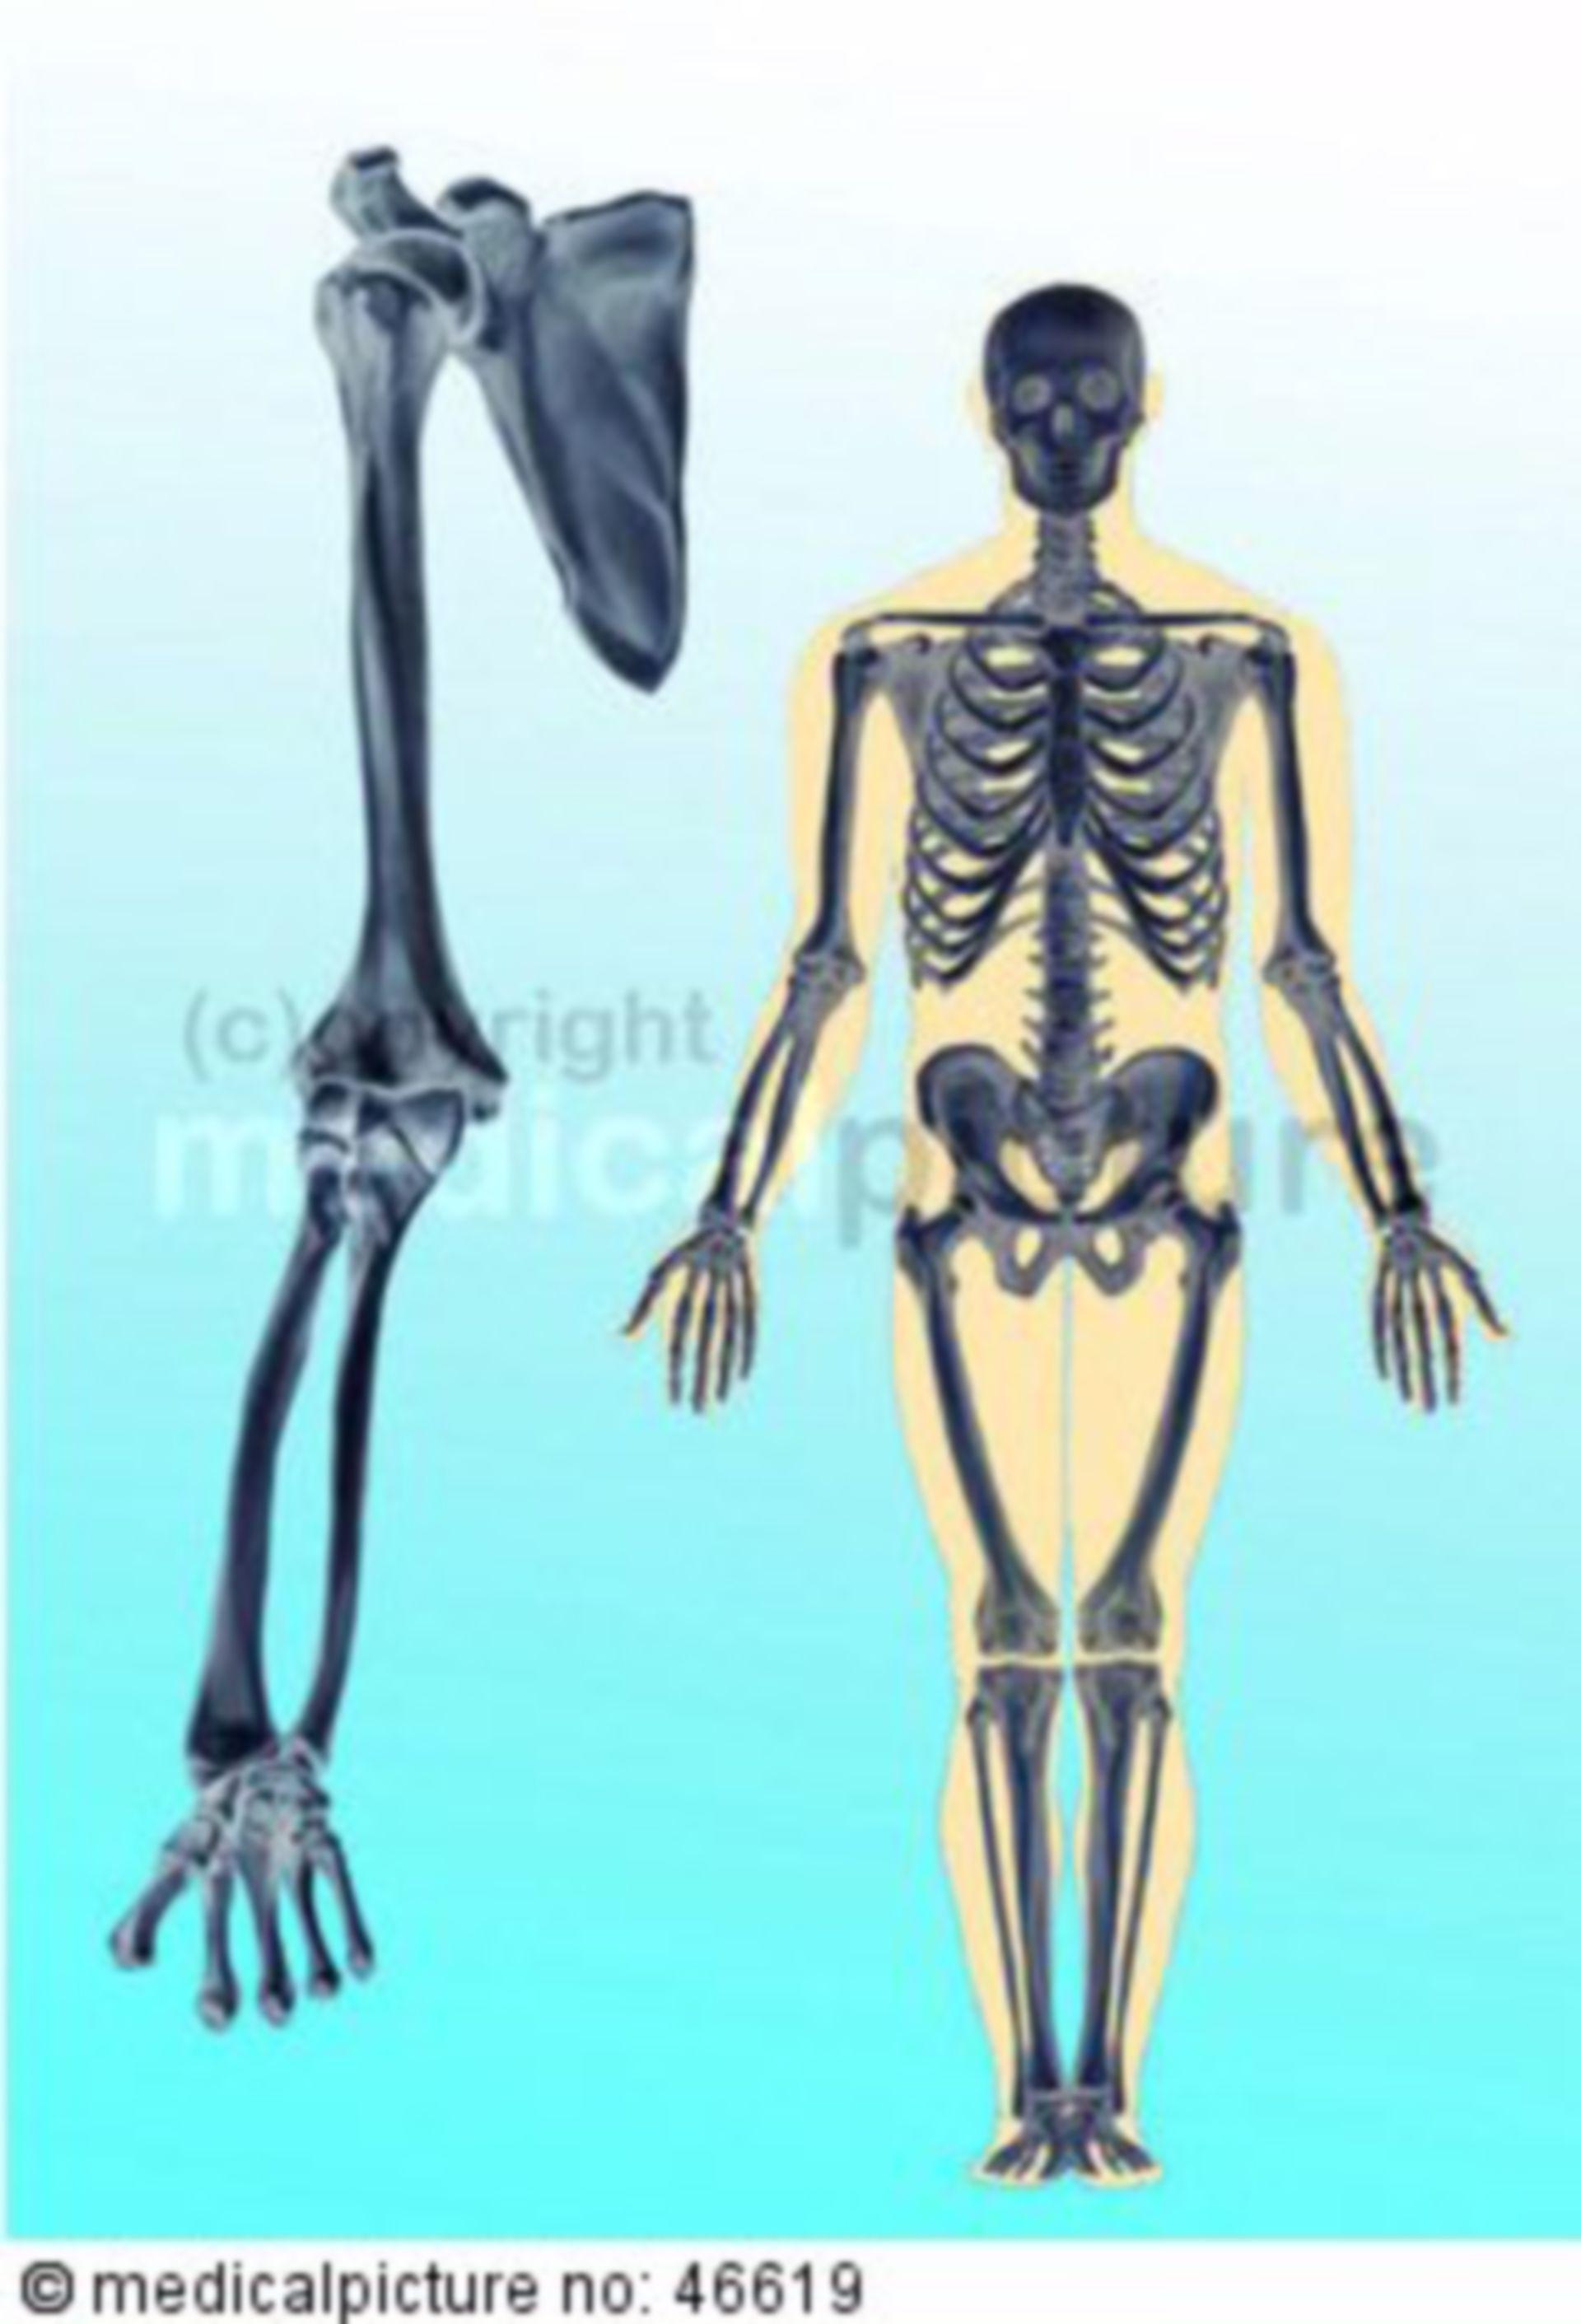 Human skeleton, upper limb